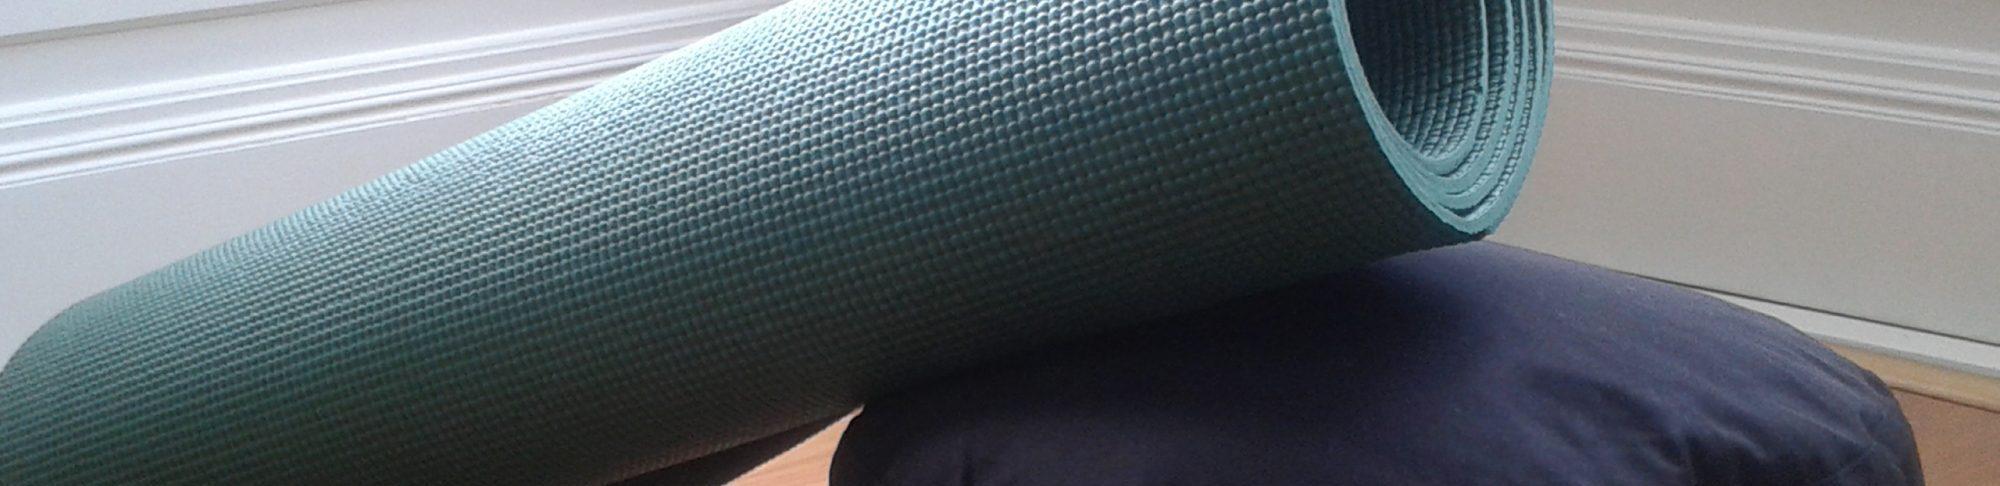 WayUp Yoga & Mindfulness